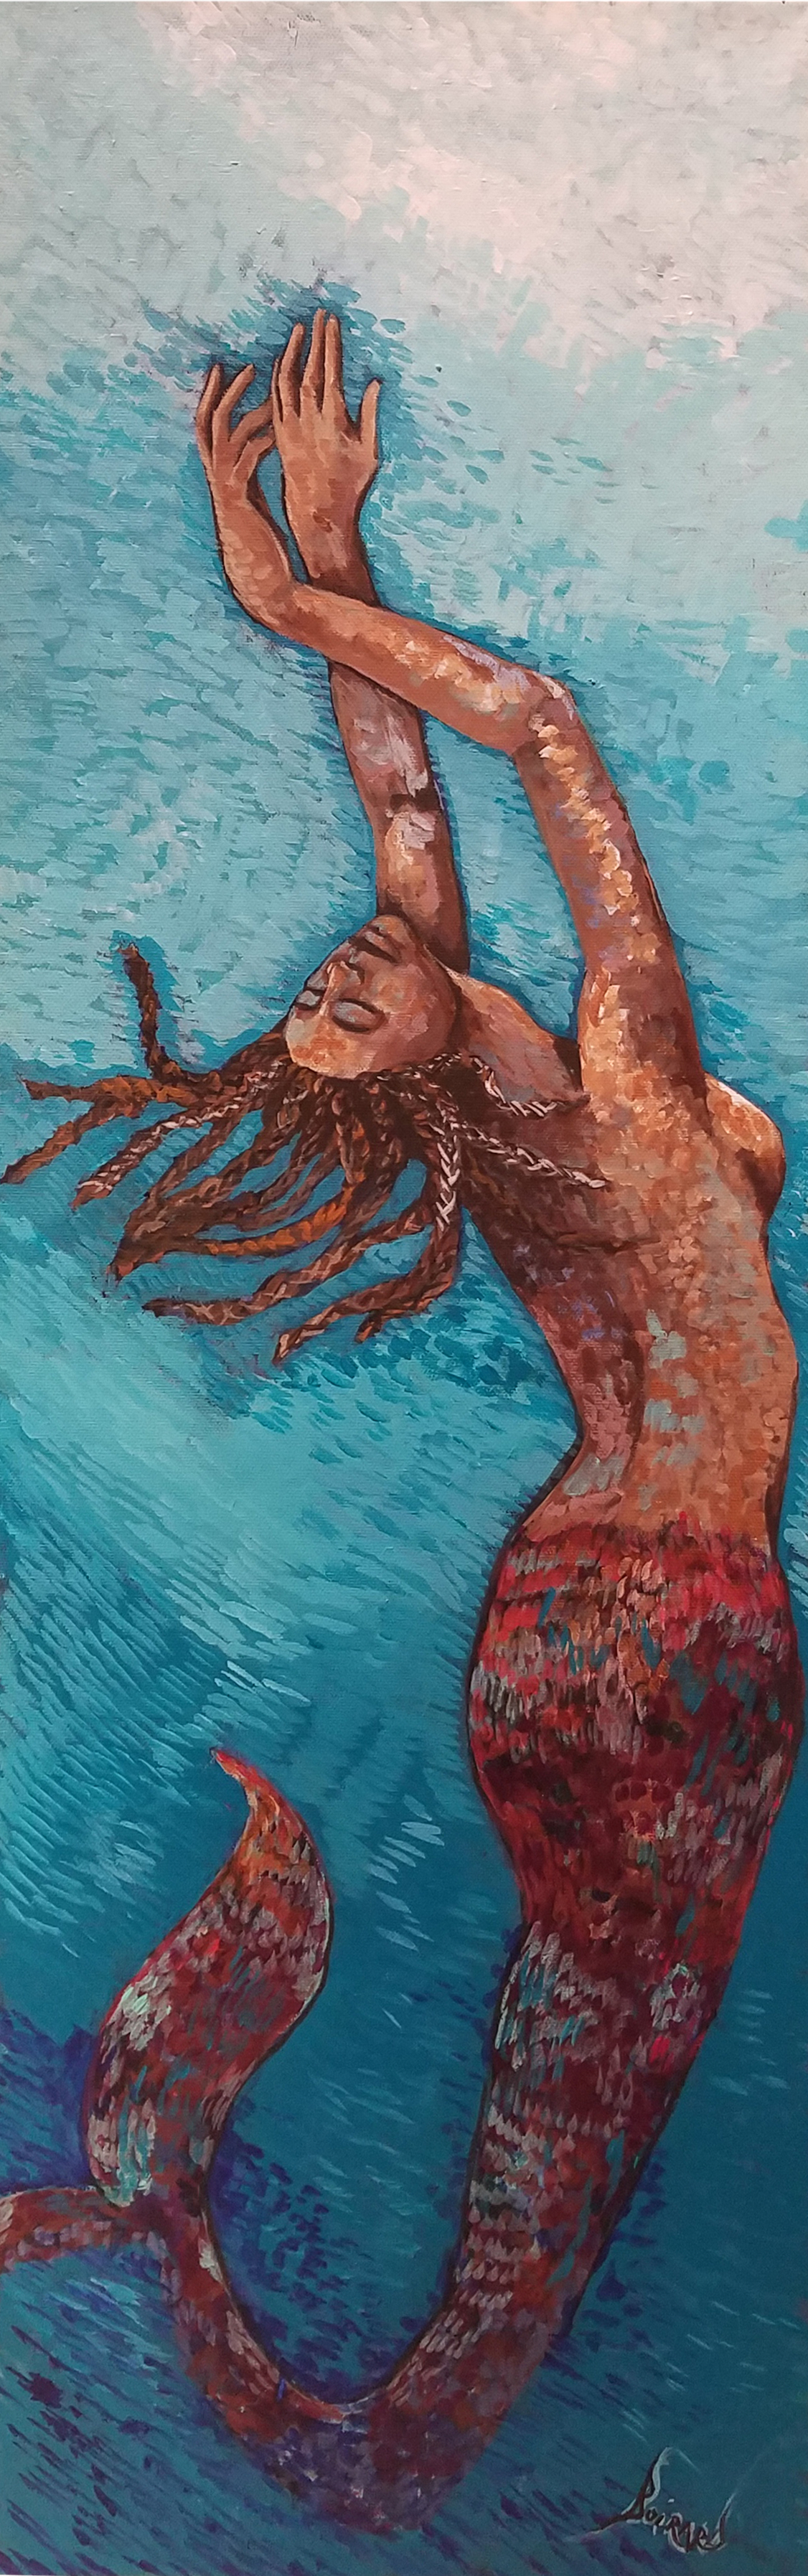 GalleryAWA-Tara Boirard-Island Beneath the Sea.jpg